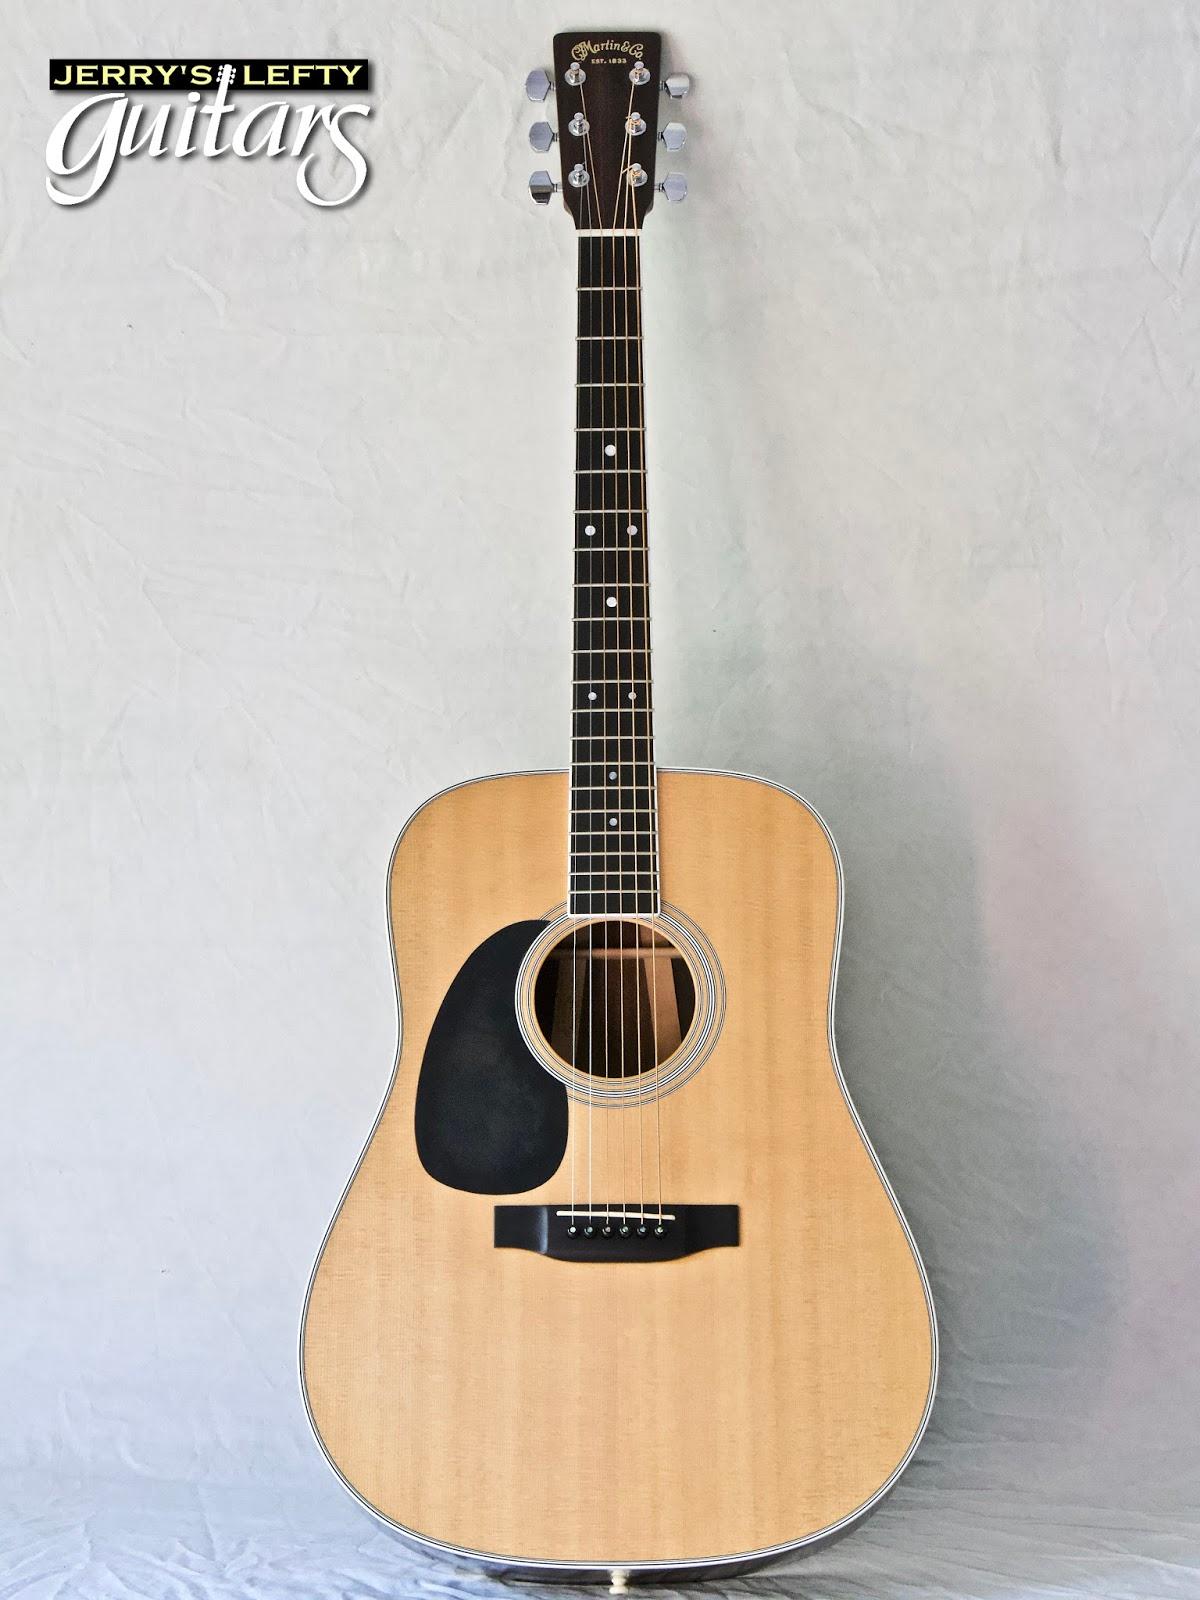 jerry 39 s lefty guitars newest guitar arrivals updated weekly 2000 martin d35 left handed. Black Bedroom Furniture Sets. Home Design Ideas